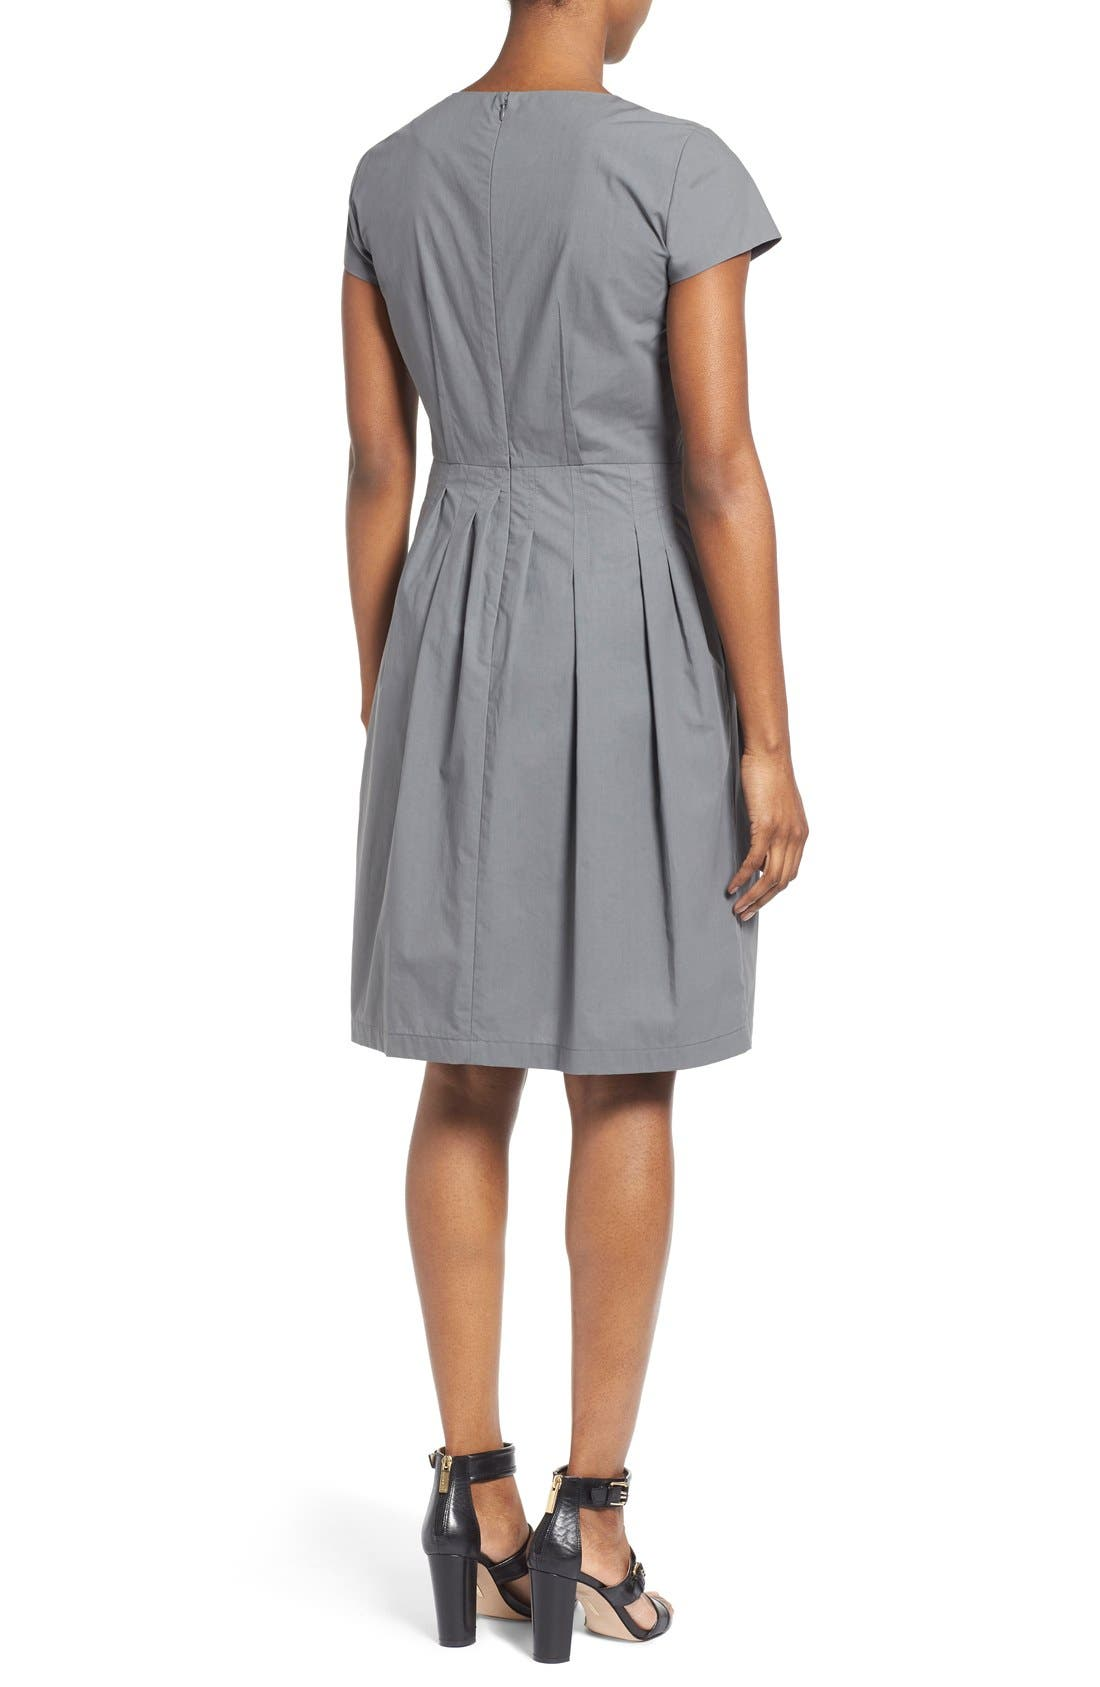 Alternate Image 3  - Lafayette 148 New York 'Gina' Cap Sleeve Fit & Flare Dress